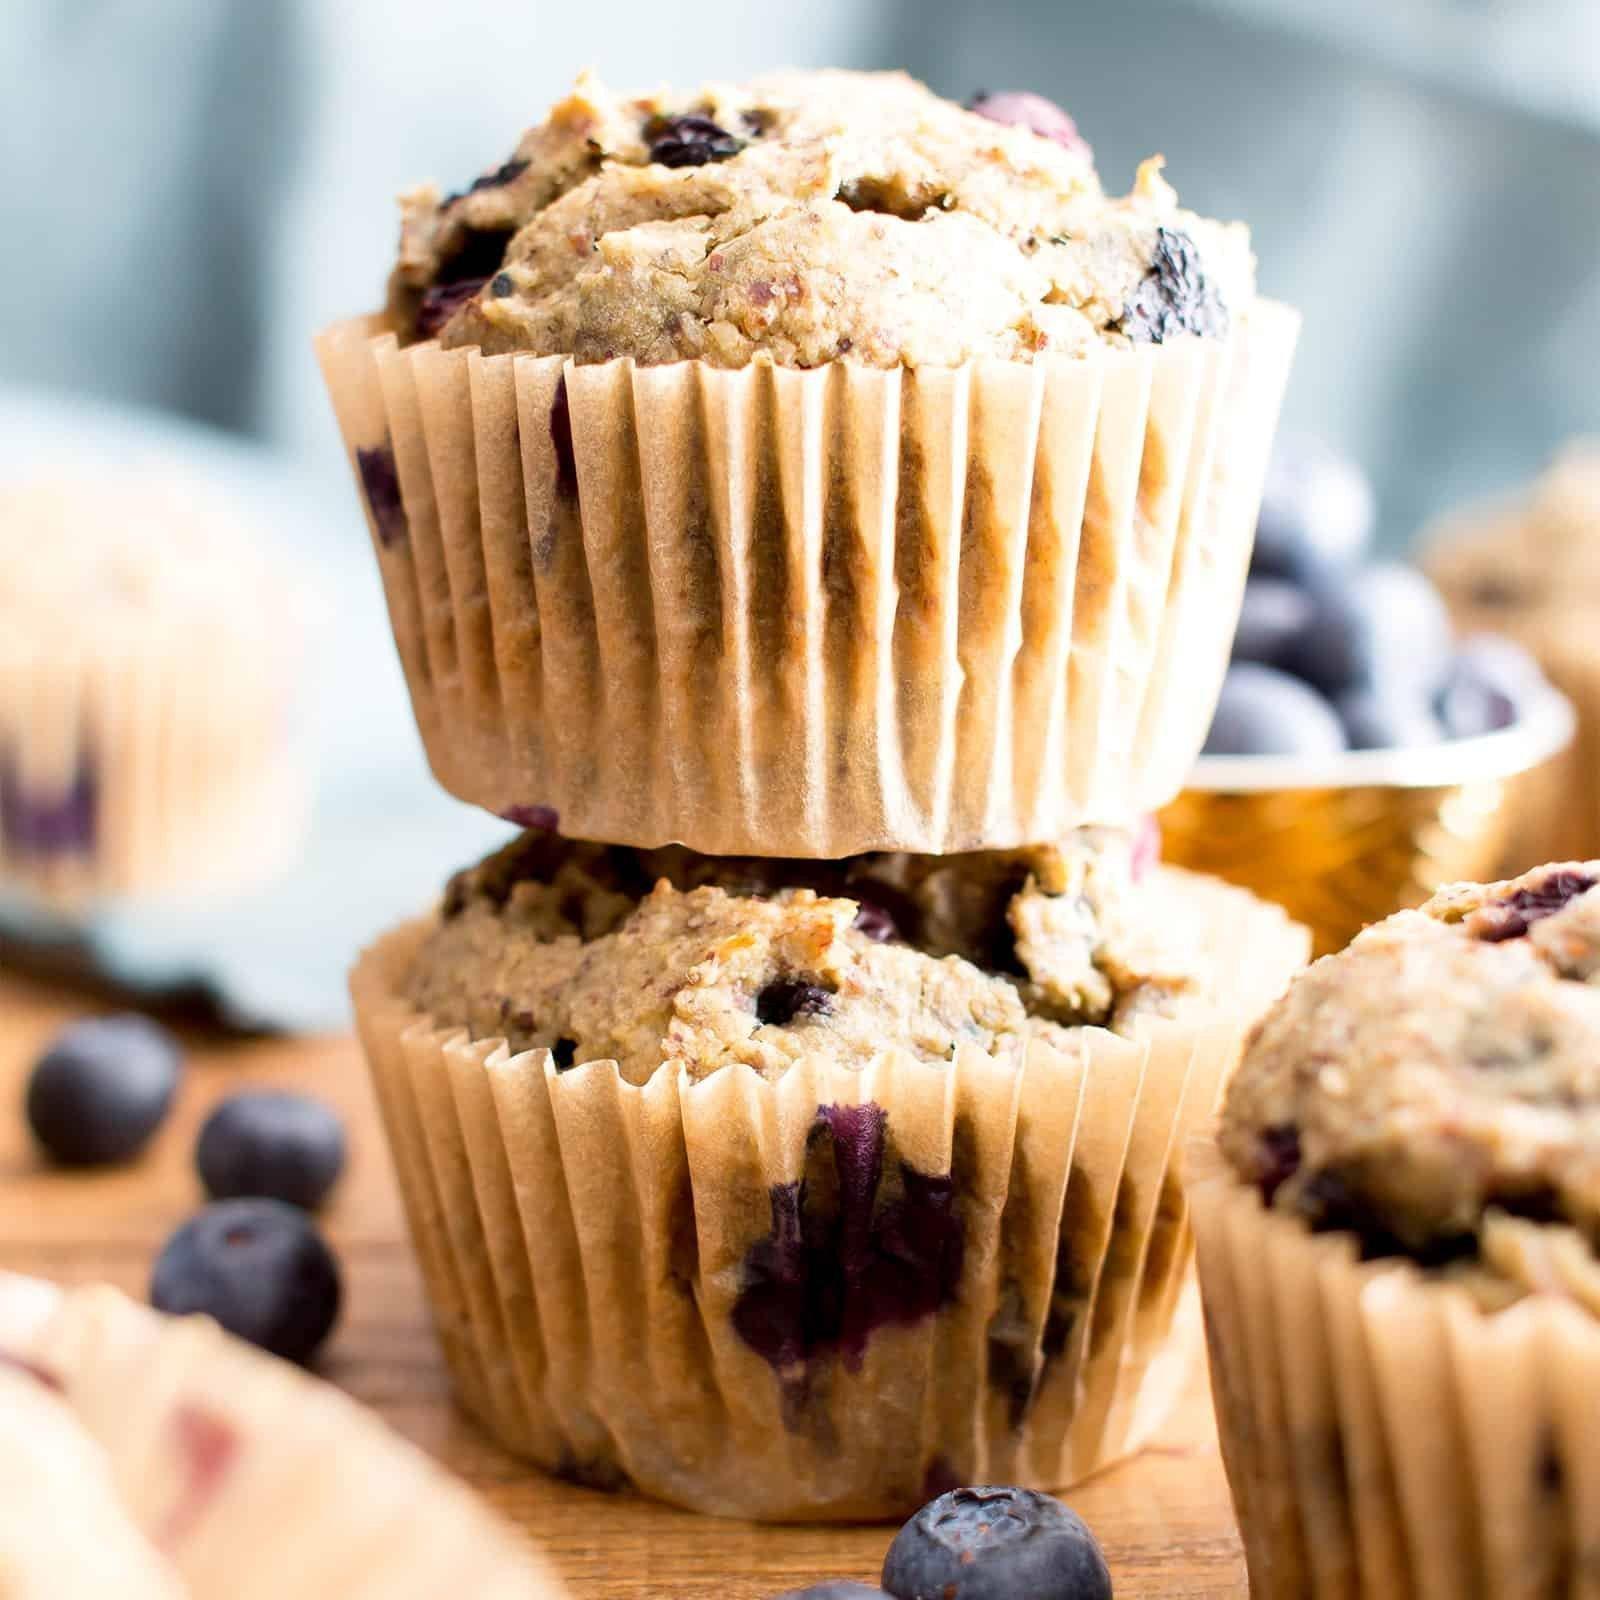 Healthy Banana Blueberry Muffins Recipe (gluten-free, Vegan, Dairy-free, Refined Sugar-free)